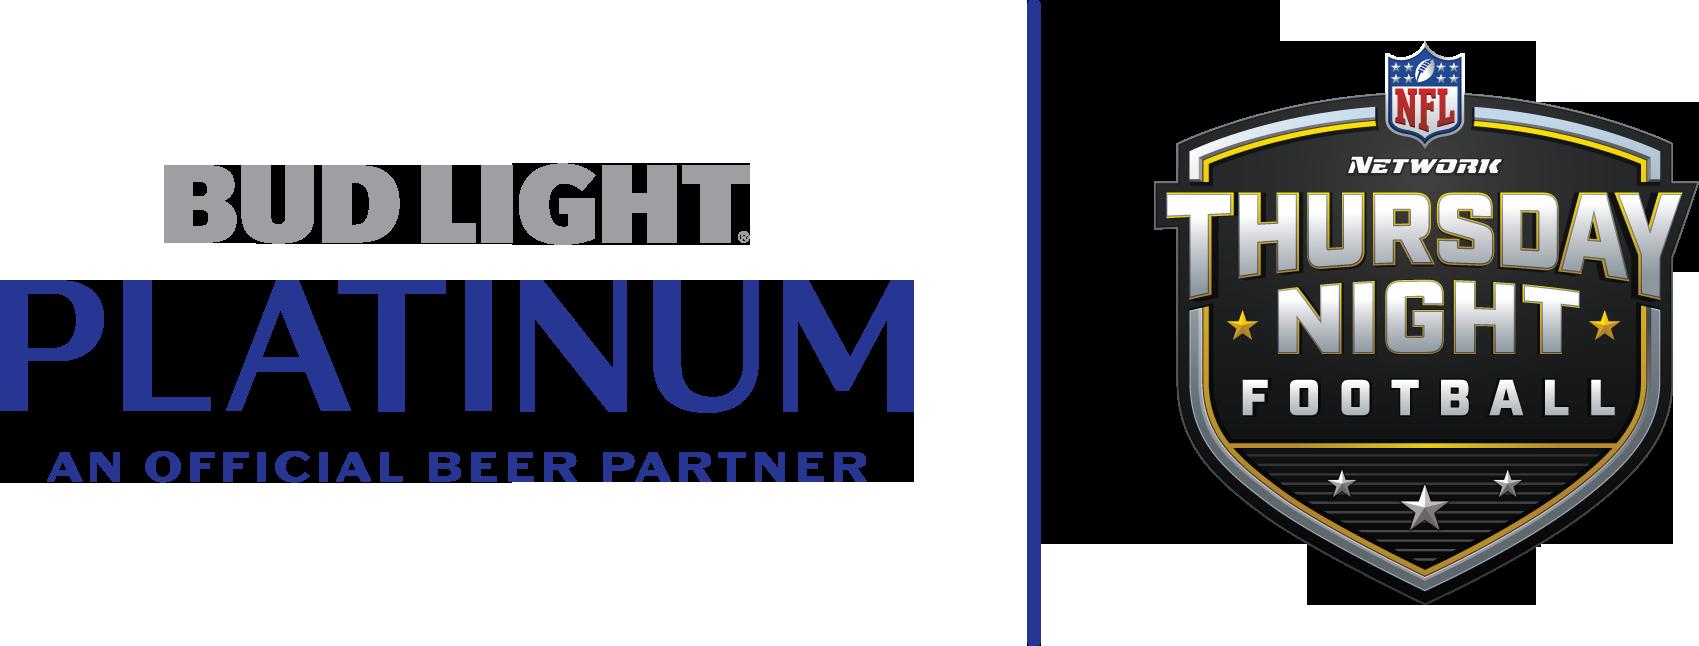 Bud Light Platinum Charlotte Agenda Thursday Night Football Tailgate Charlotte Agenda